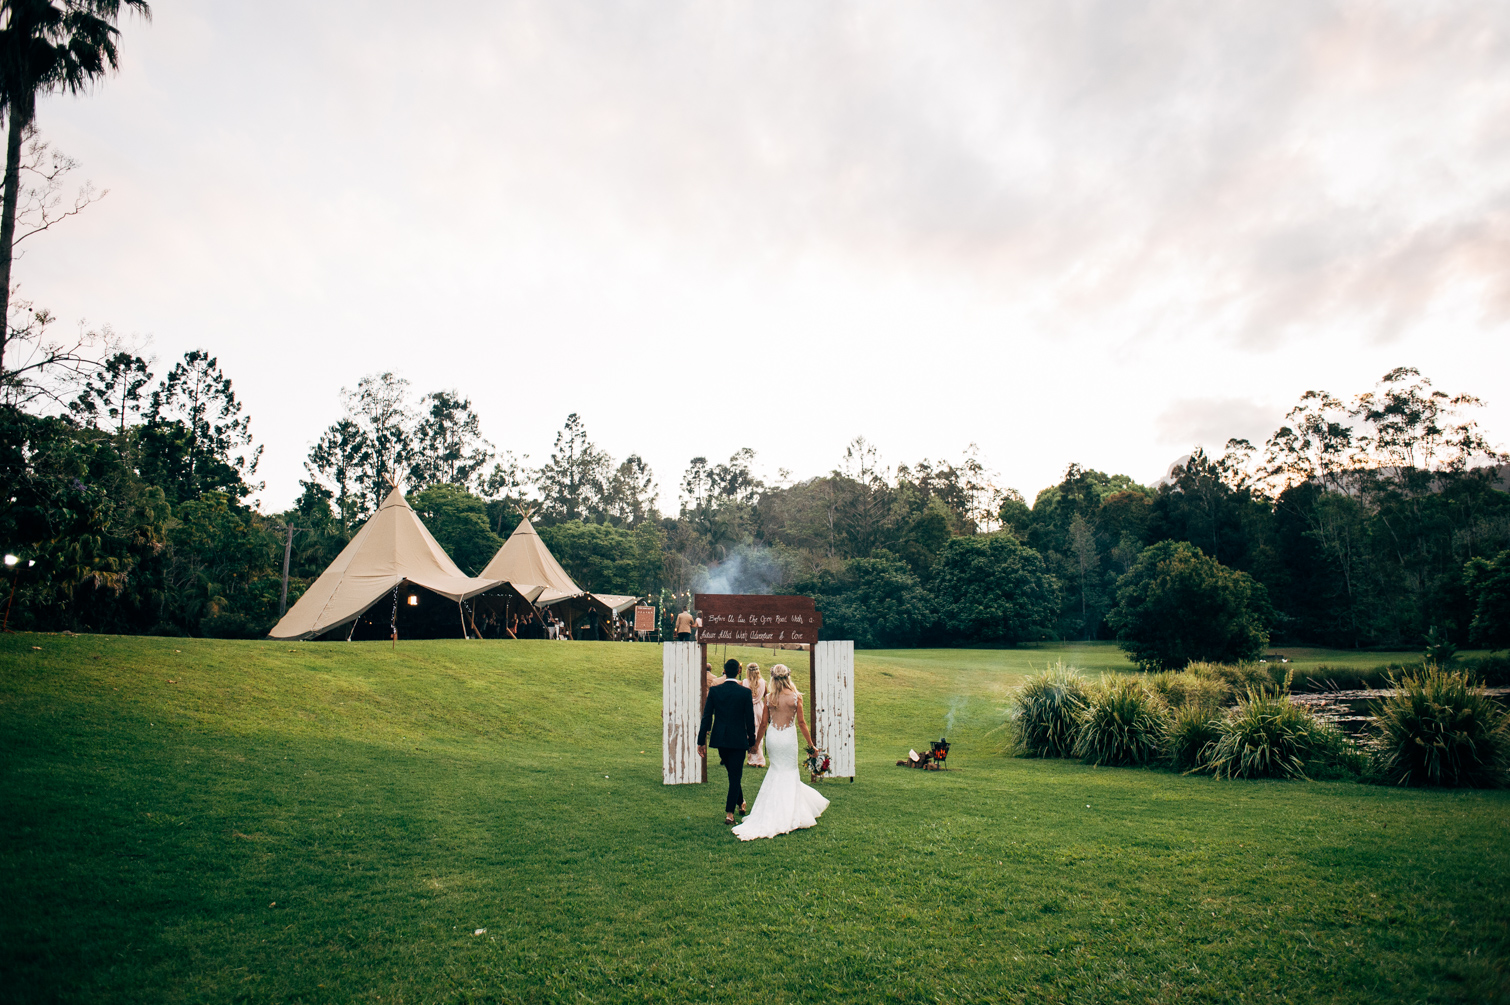 Maviss_kitchen_tipi_wedding venue-58.jpg